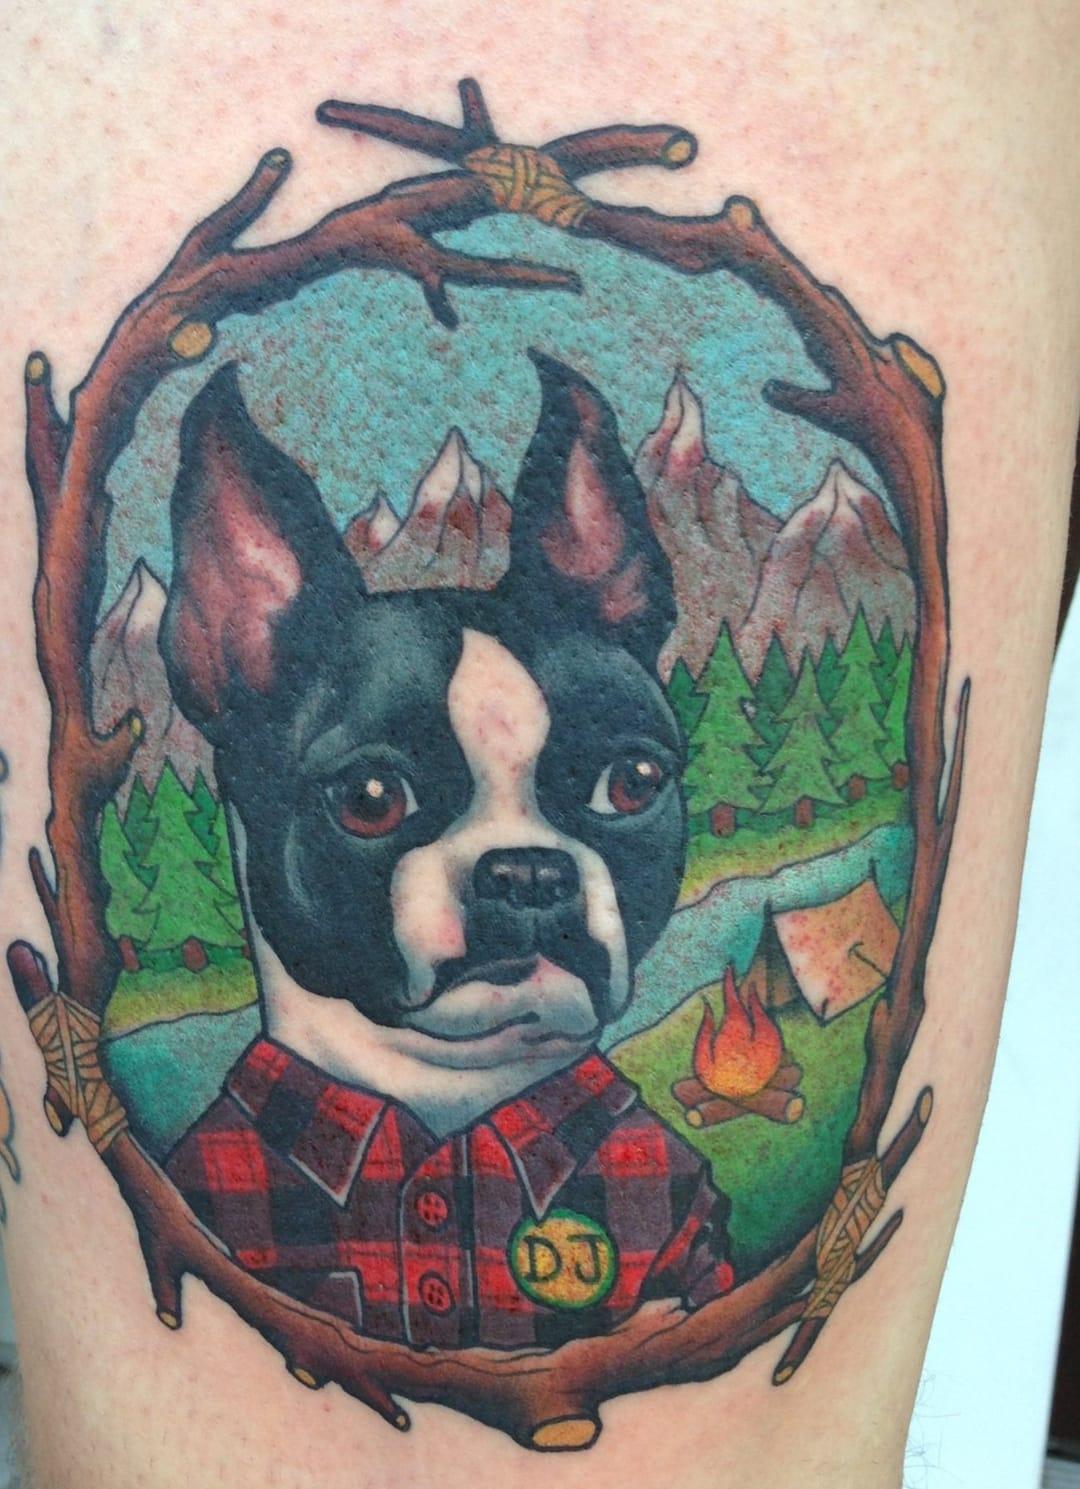 Tatuagem de David Bruehl